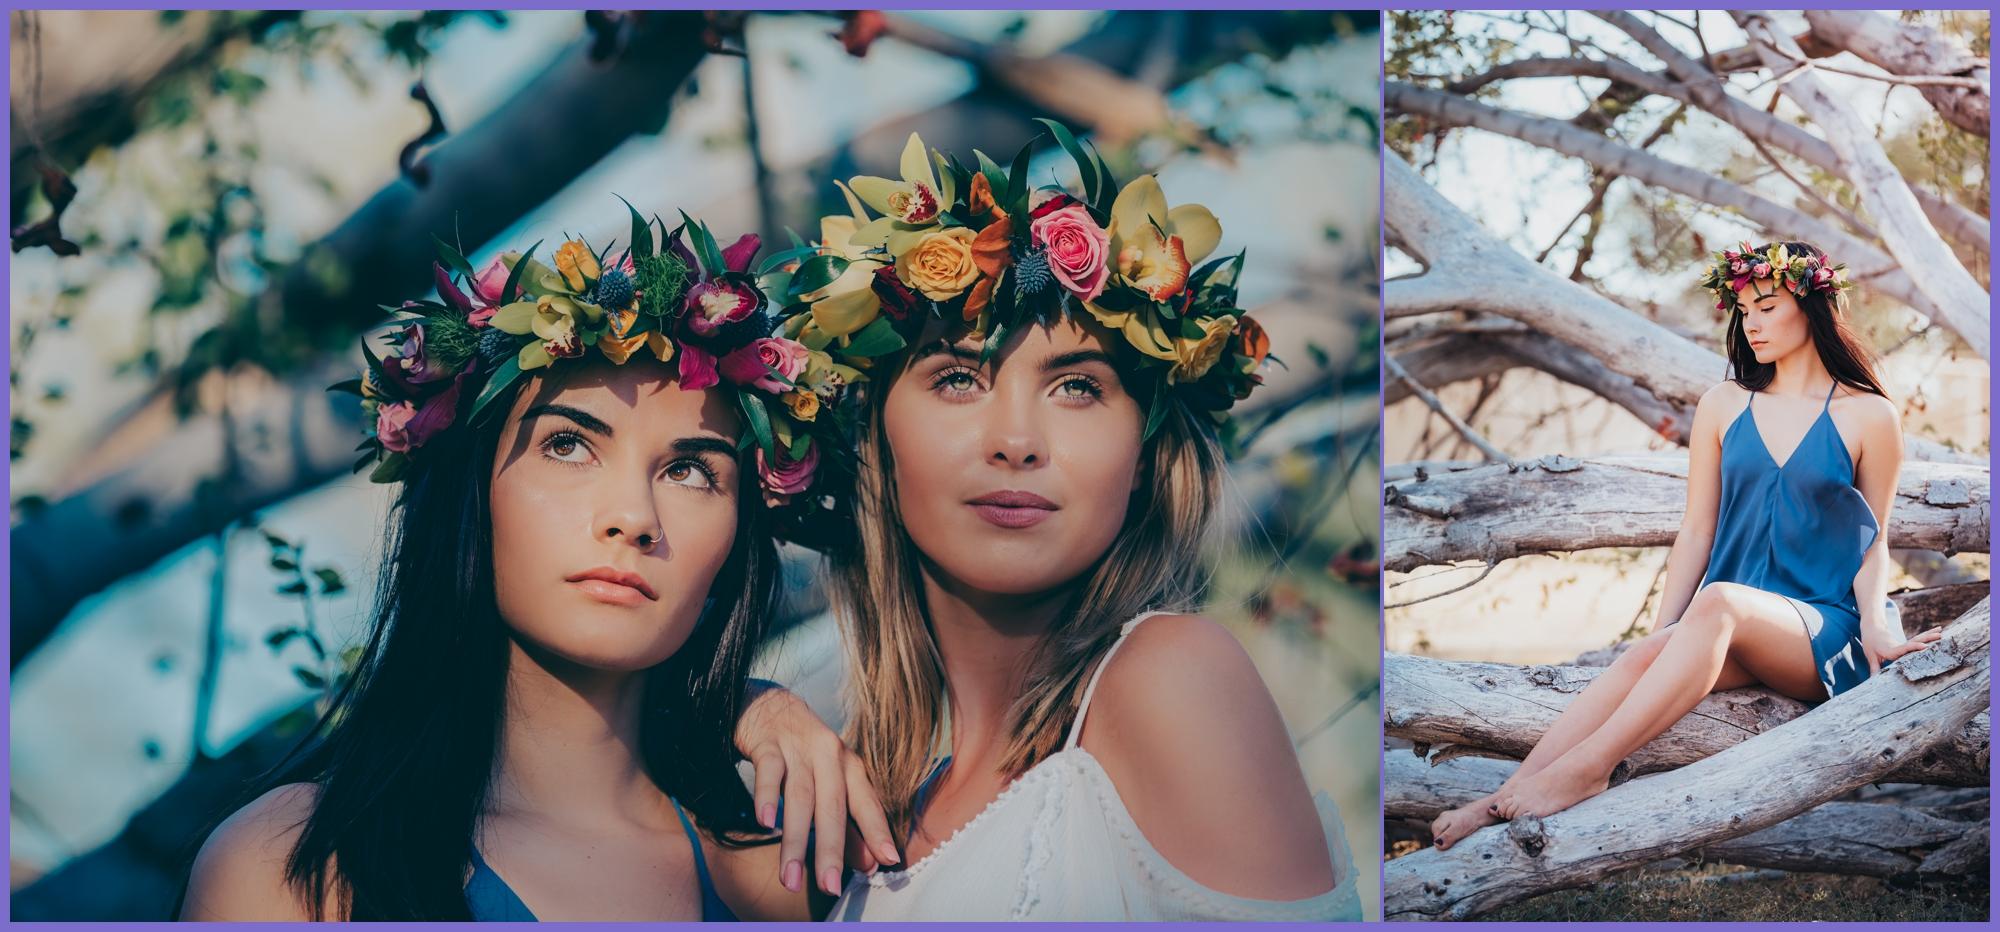 Two models with flower crowns haku - oahu glamour photographer - ketino photography.jpg